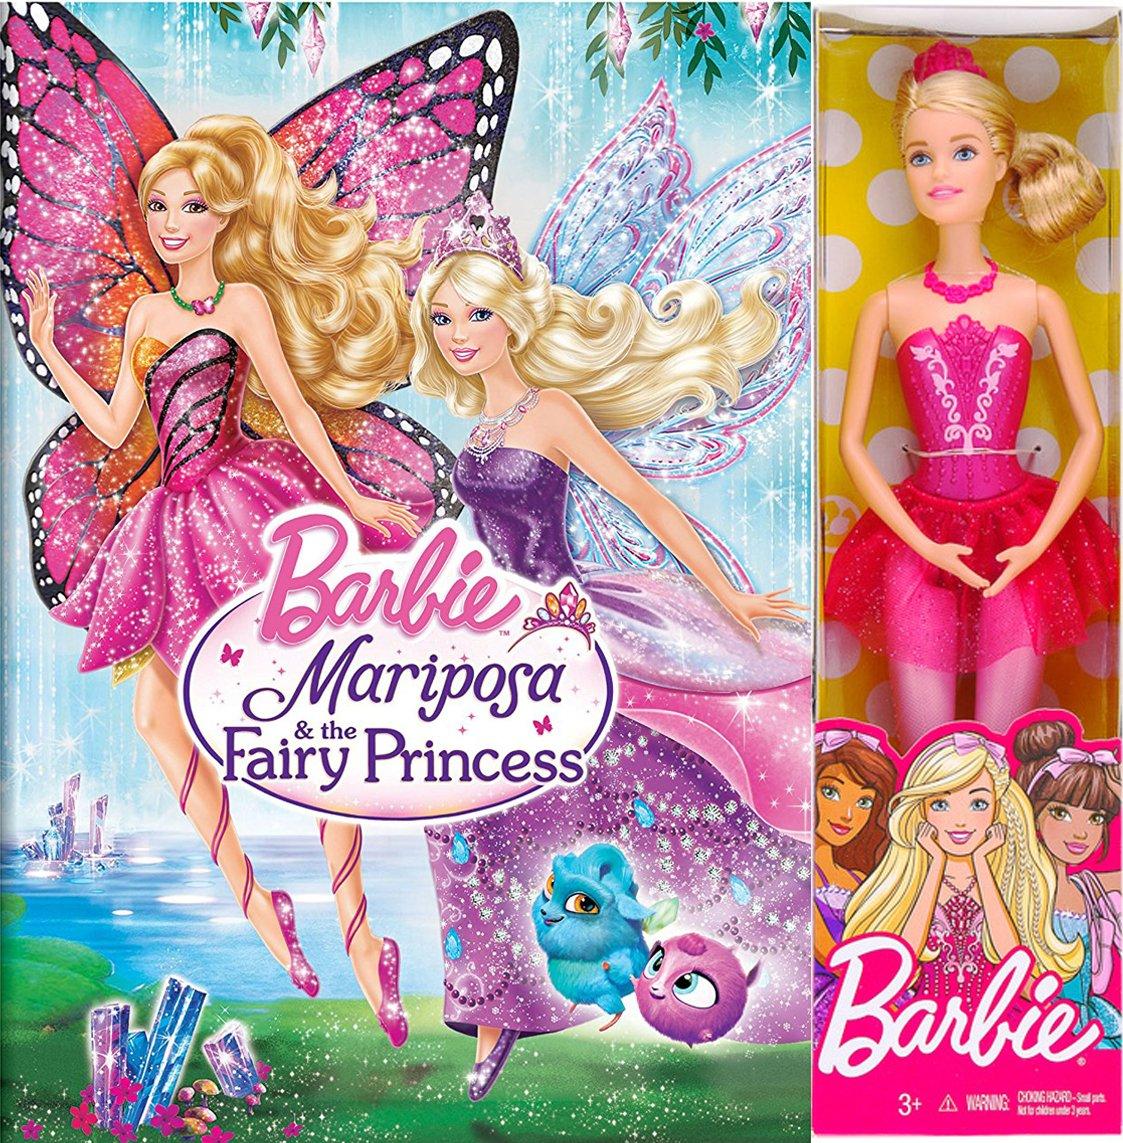 amazon com barbie girls mariposa the fairy princess animated movie barbie doll set pink ballerina 12 barbie bundle various various movies tv barbie doll set pink ballerina